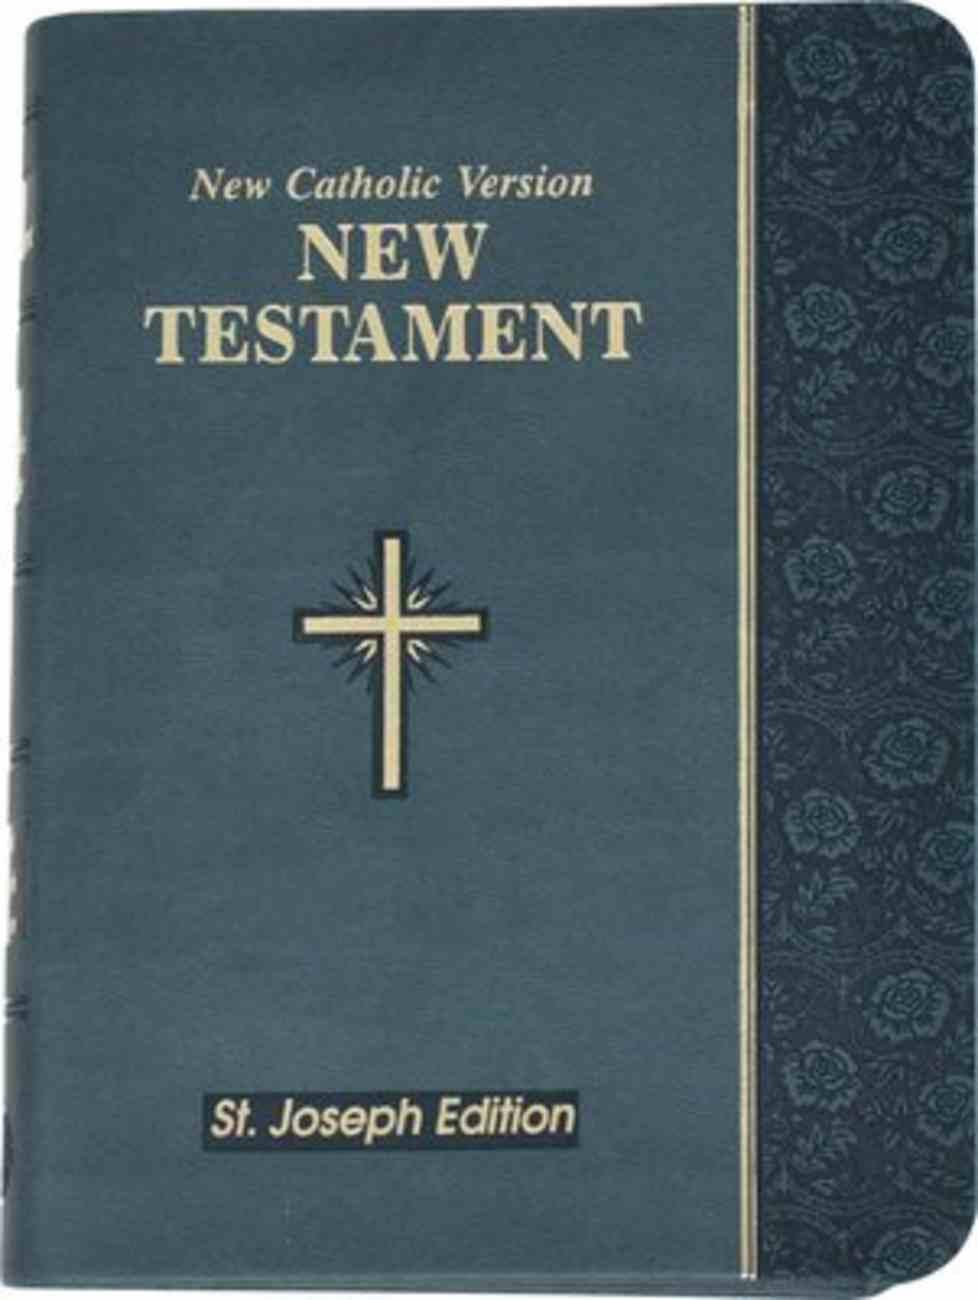 New Catholic Version St. Joseph New Testament Vest Pocket Slate Imitation Leather